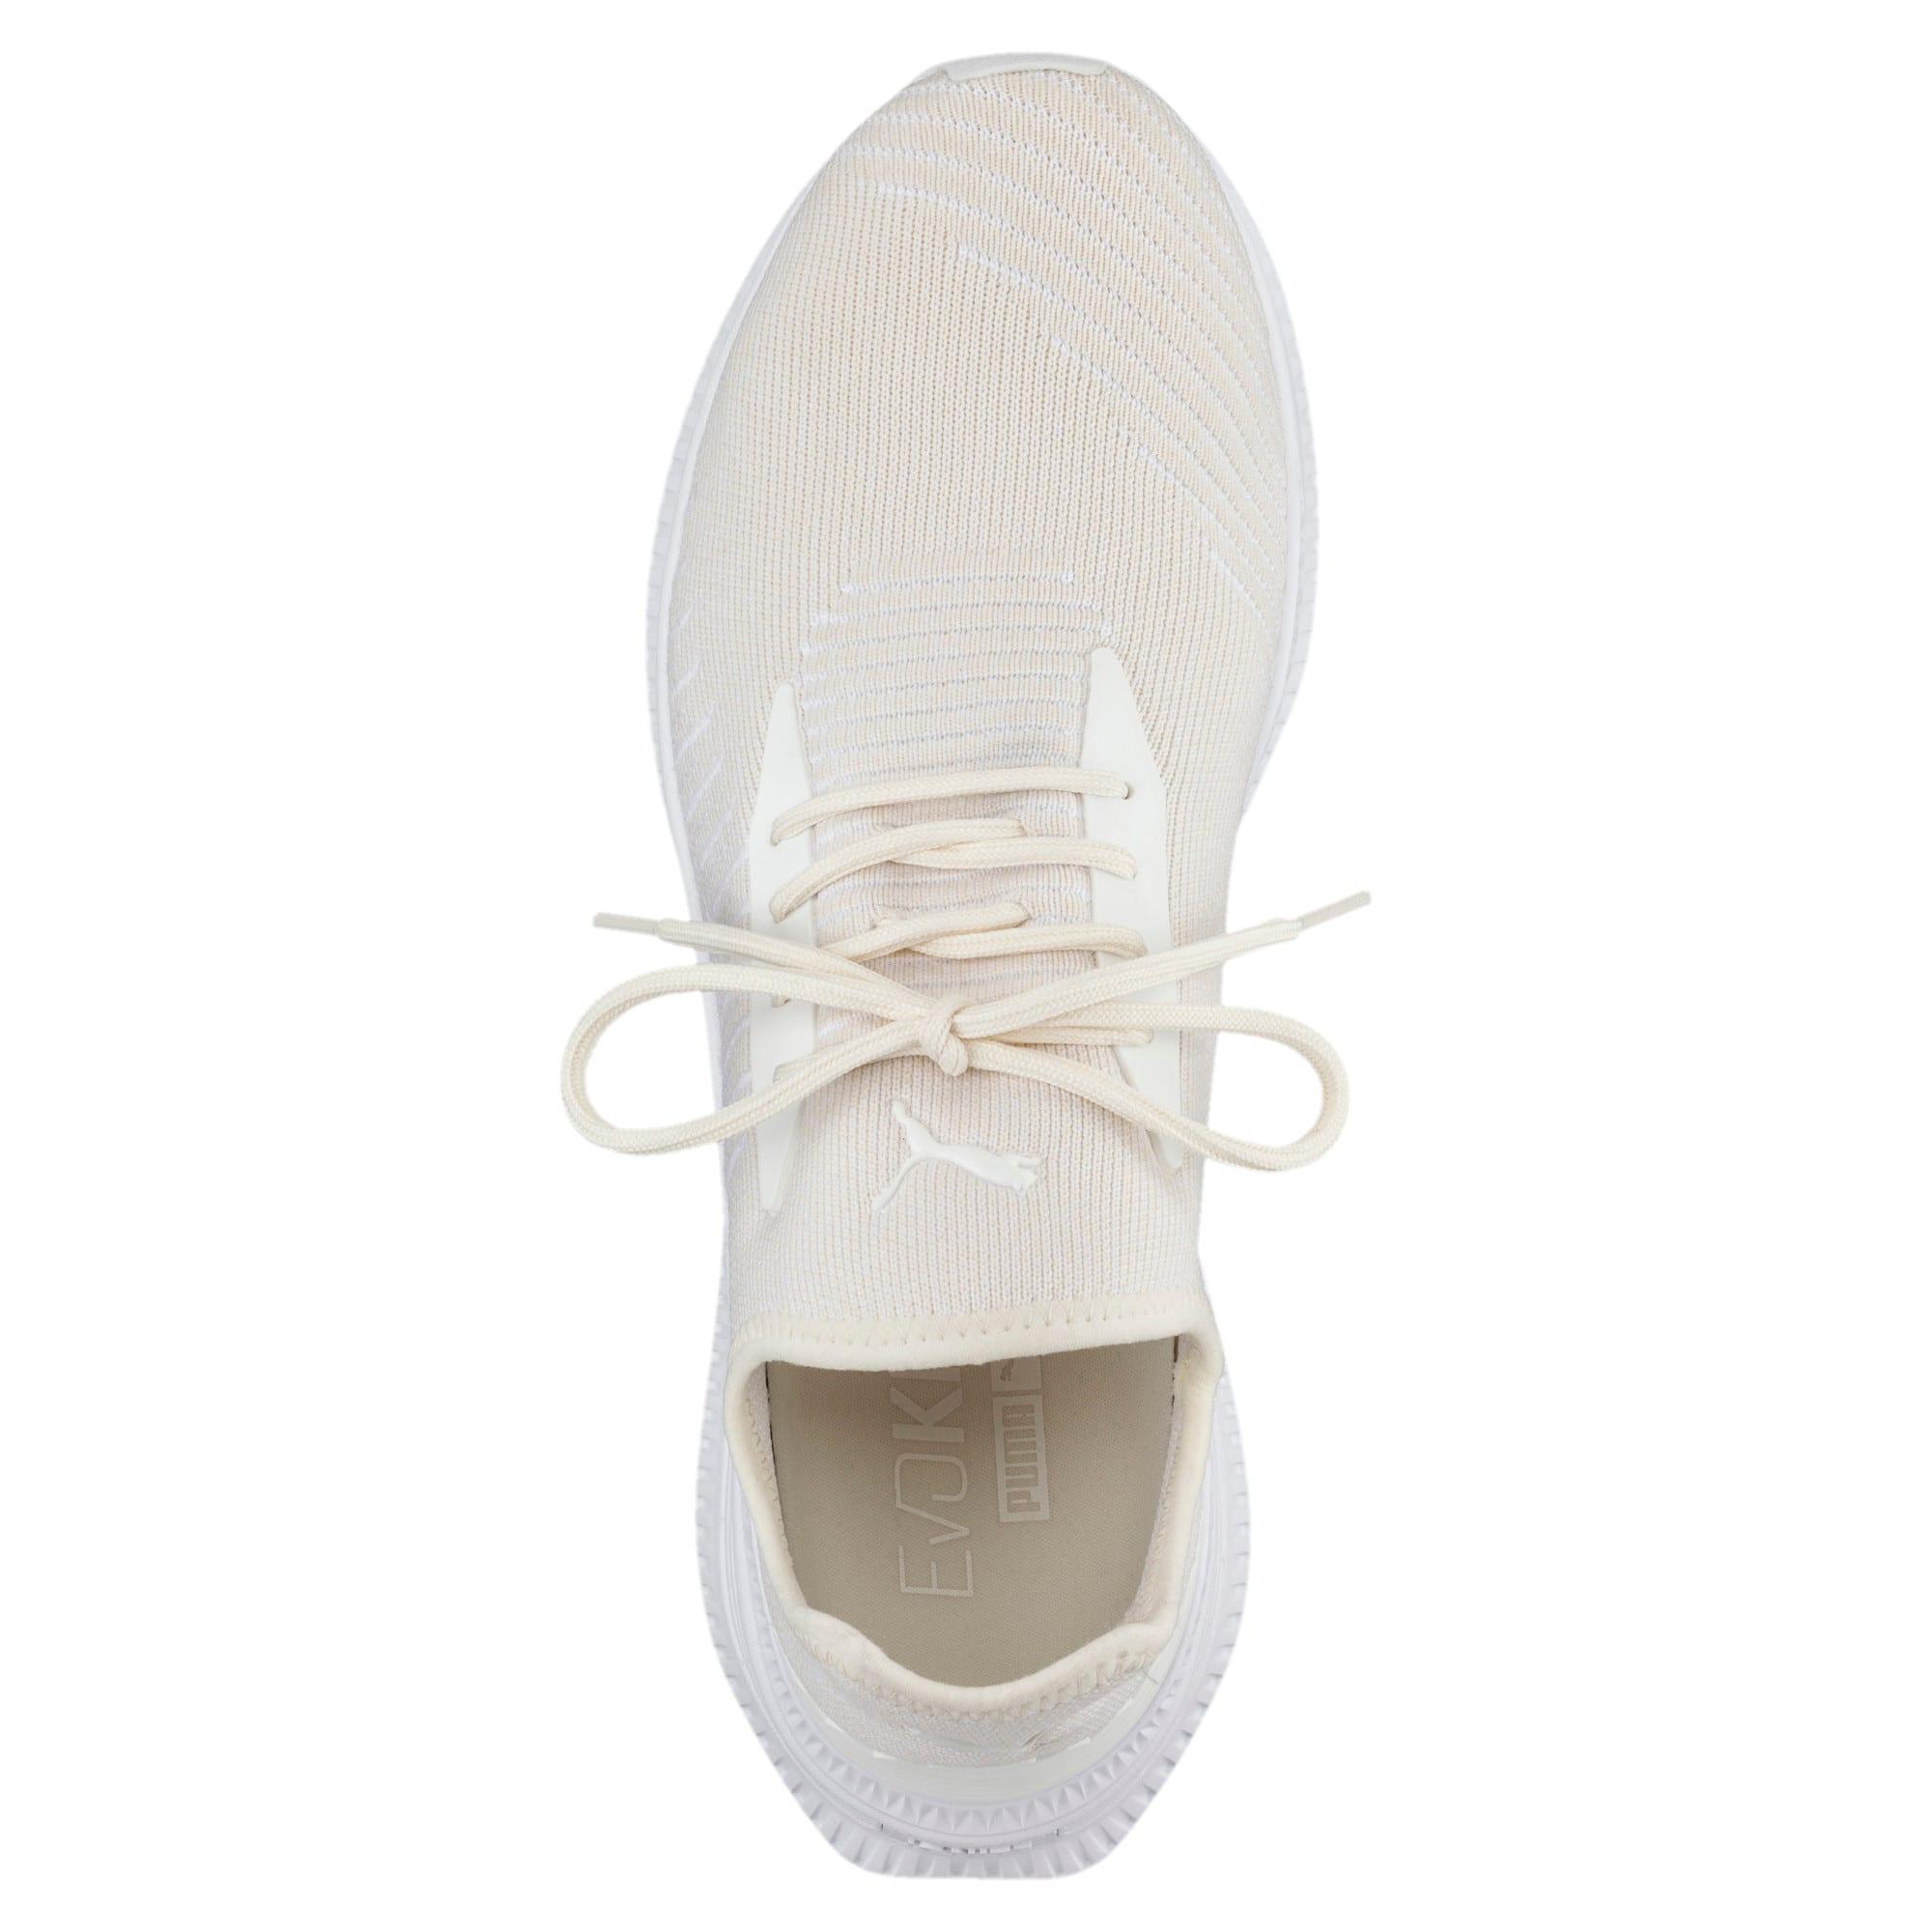 Thumbnail 5 of AVID Men's Sneakers, Whisper White-Puma White, medium